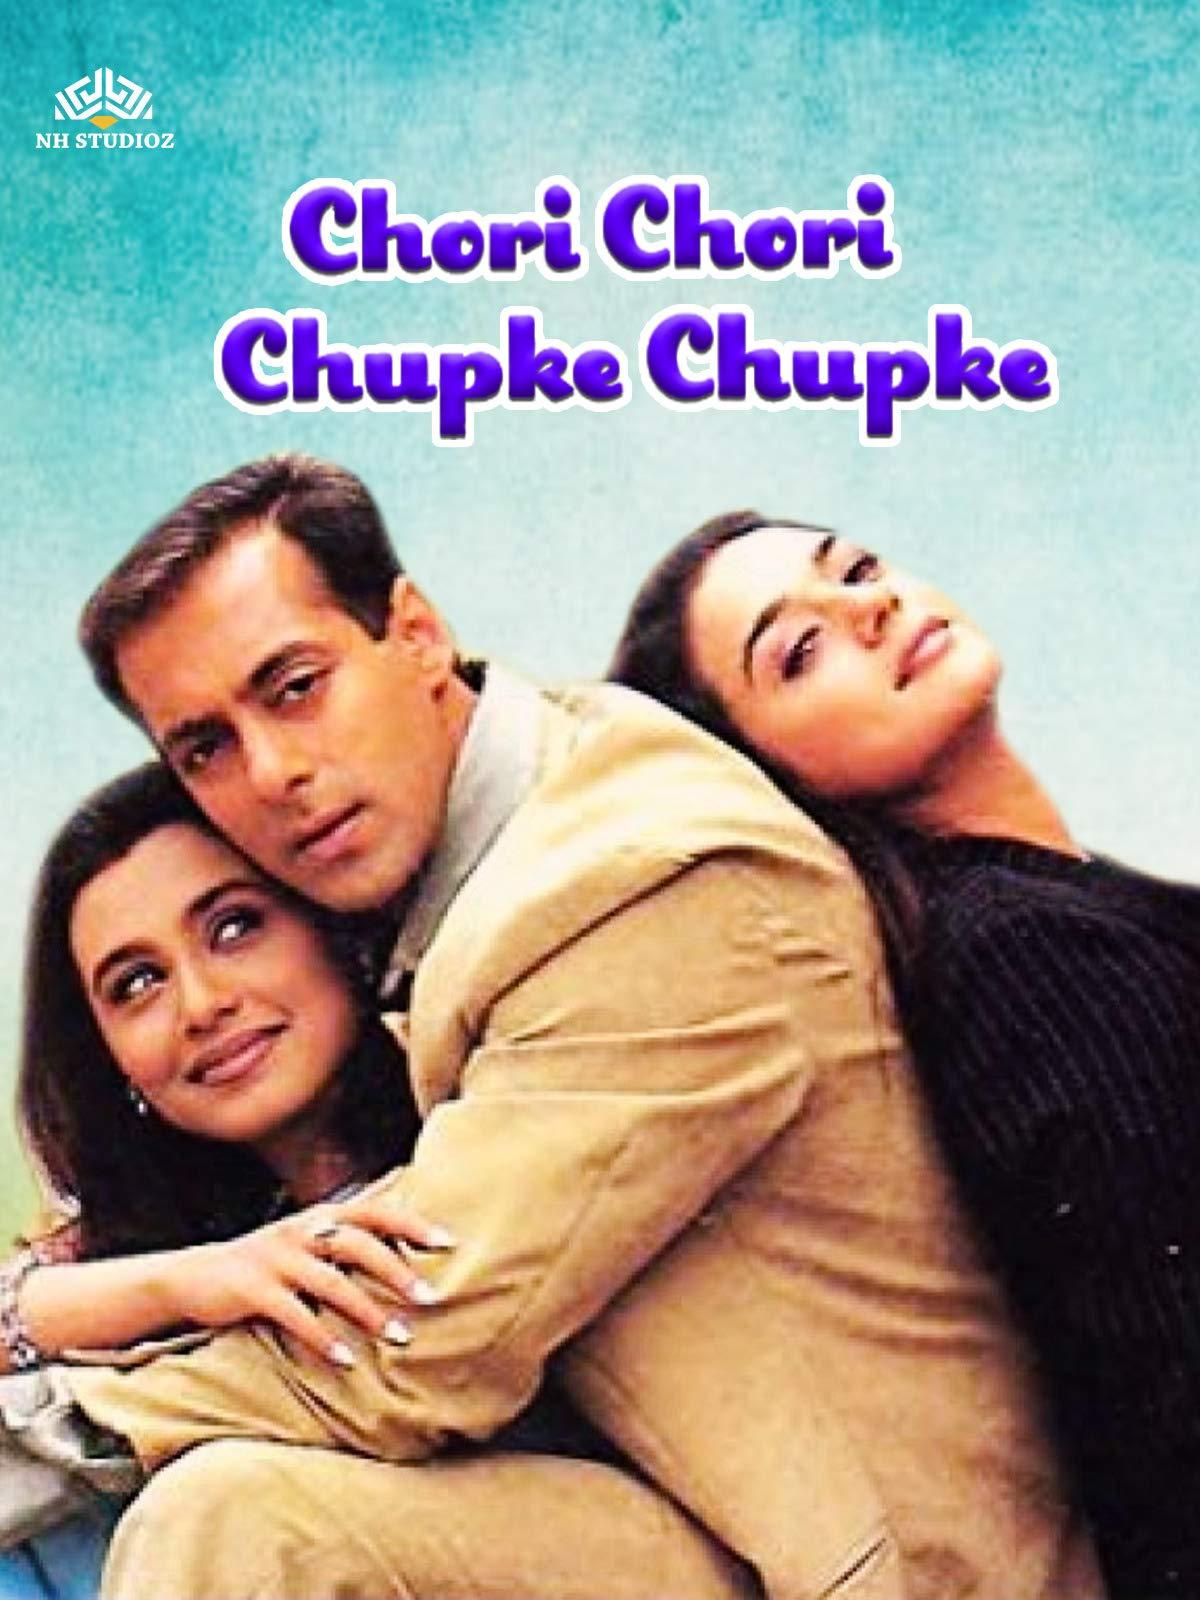 Watch Chori Chori Chupke Chupke | Prime Video